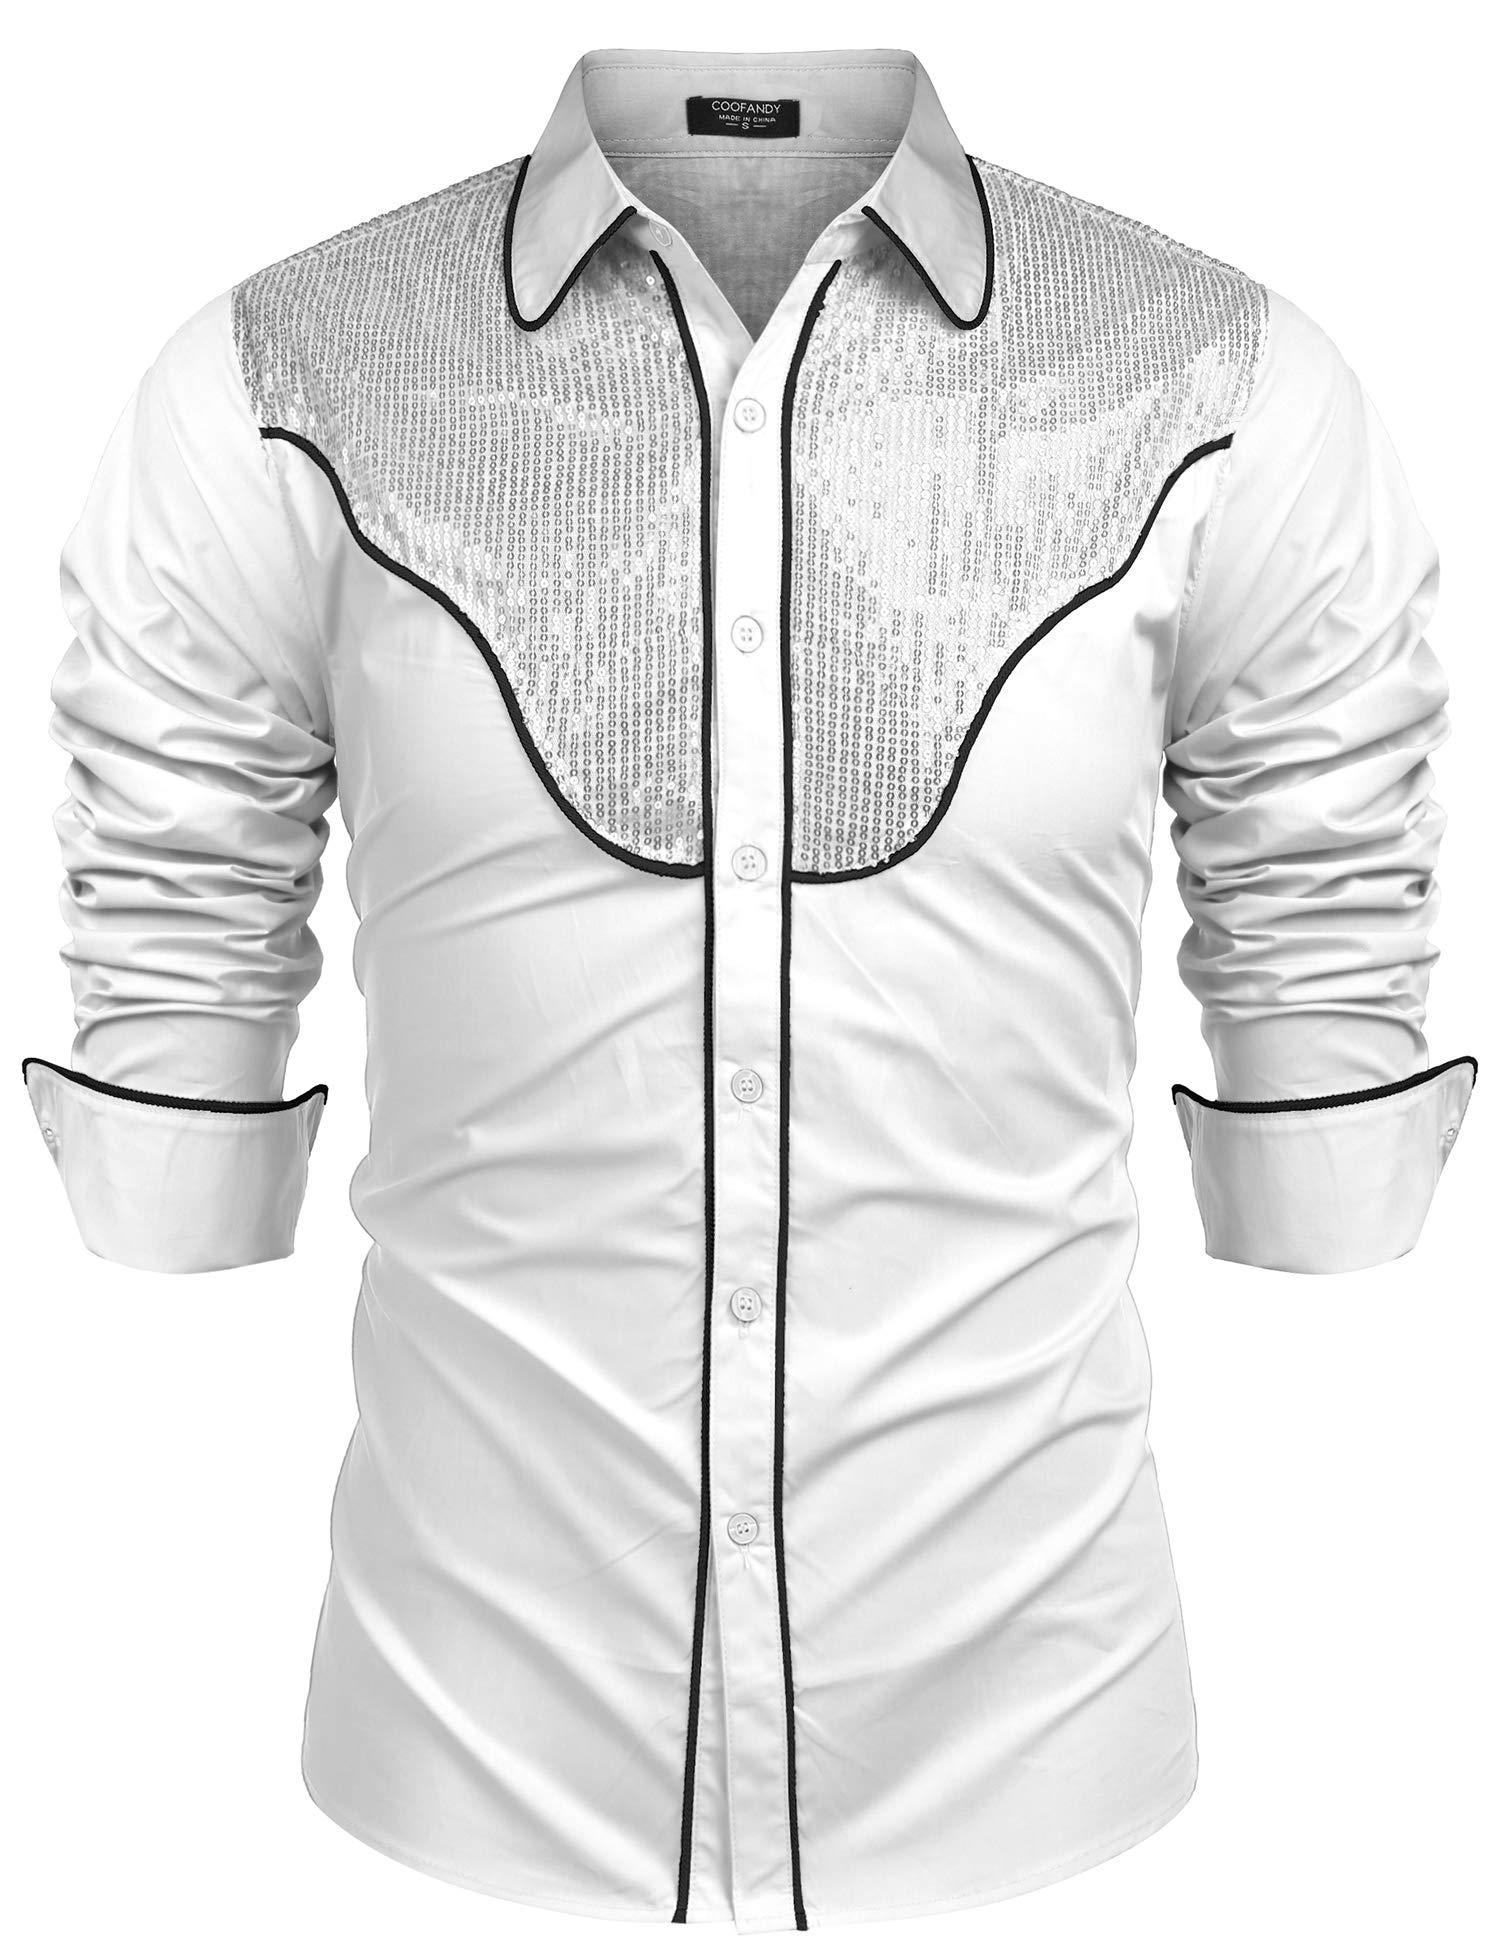 0e7510dc0e9 COOFANDY Men s Embroidered Button Down Shirt Cowboy Western Long Sleeve  Dress Shirts (White M)